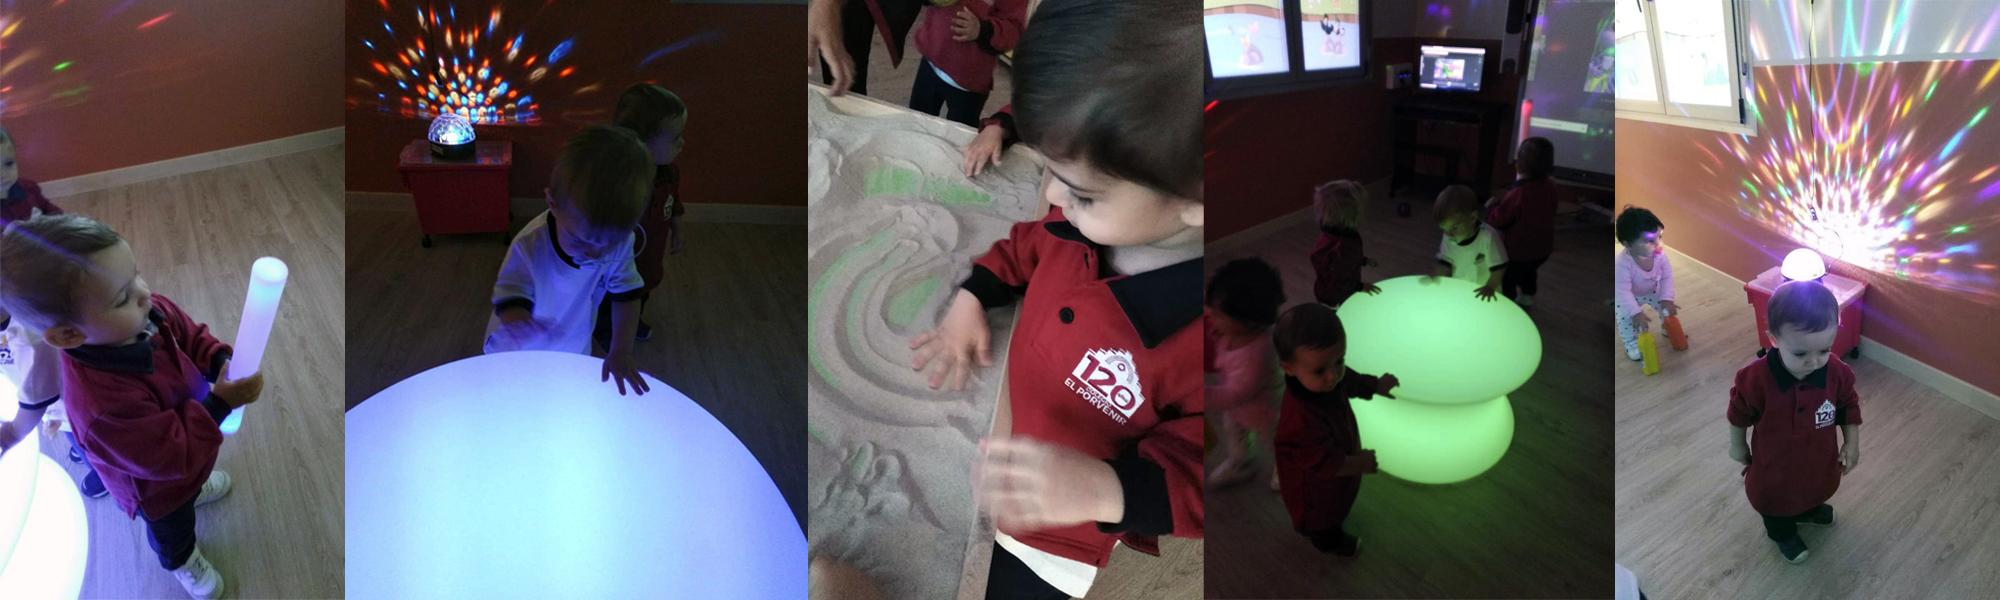 Aula Multisensorial Escuela Infantil El Porvenir